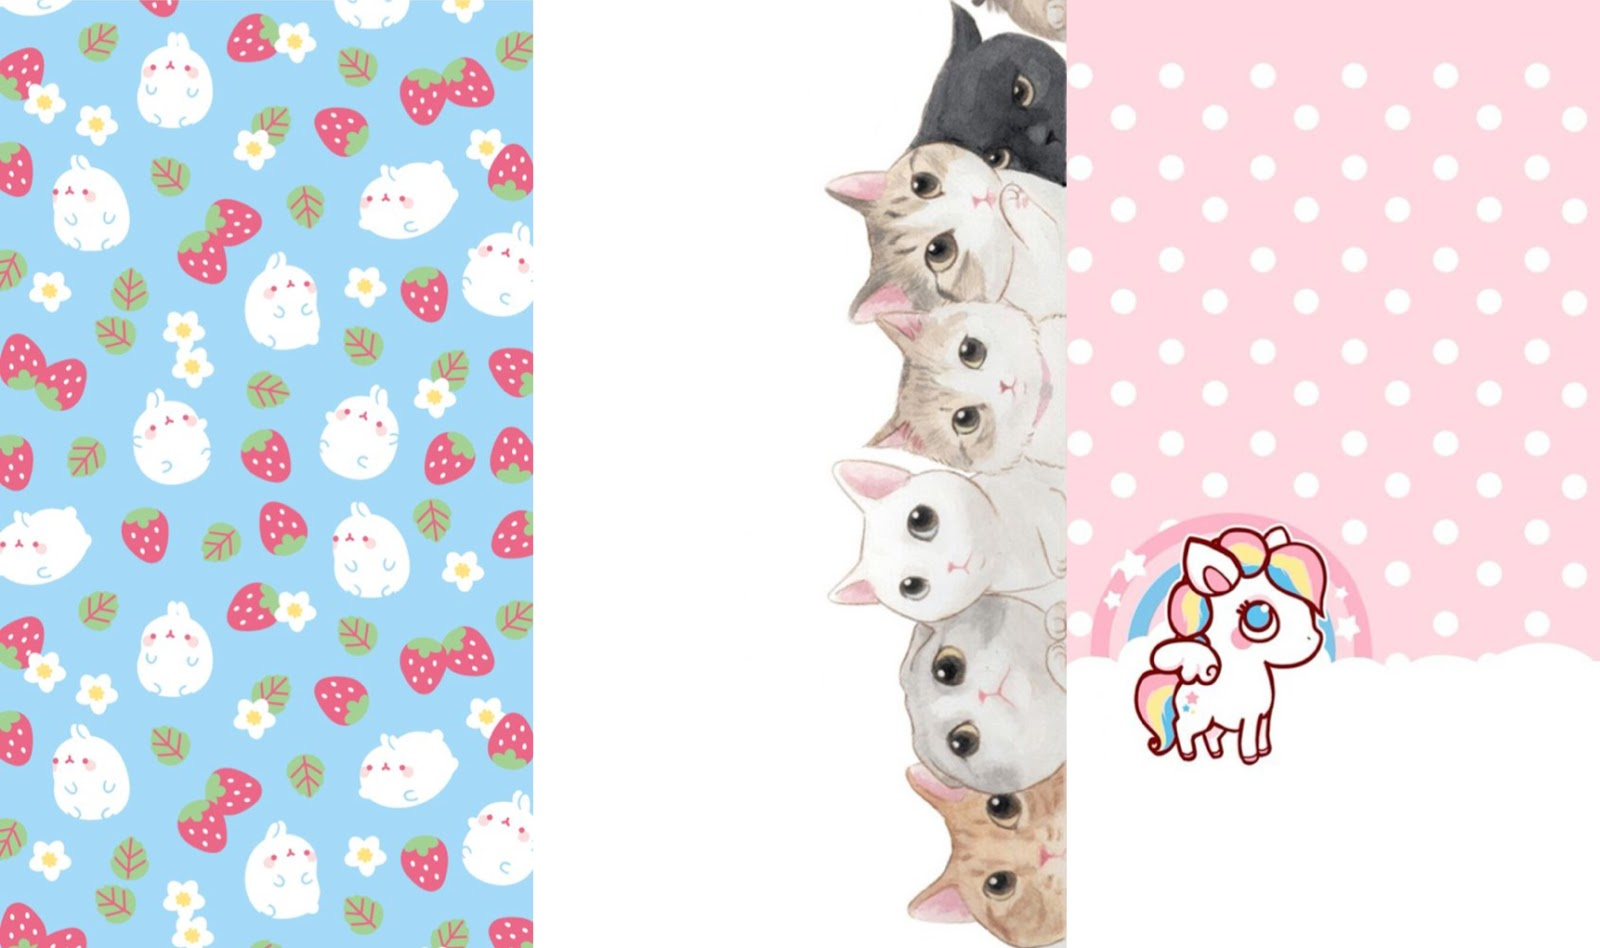 12 super cute kawaii wallpapers for your phone ashton jade - Kawaii phone backgrounds ...